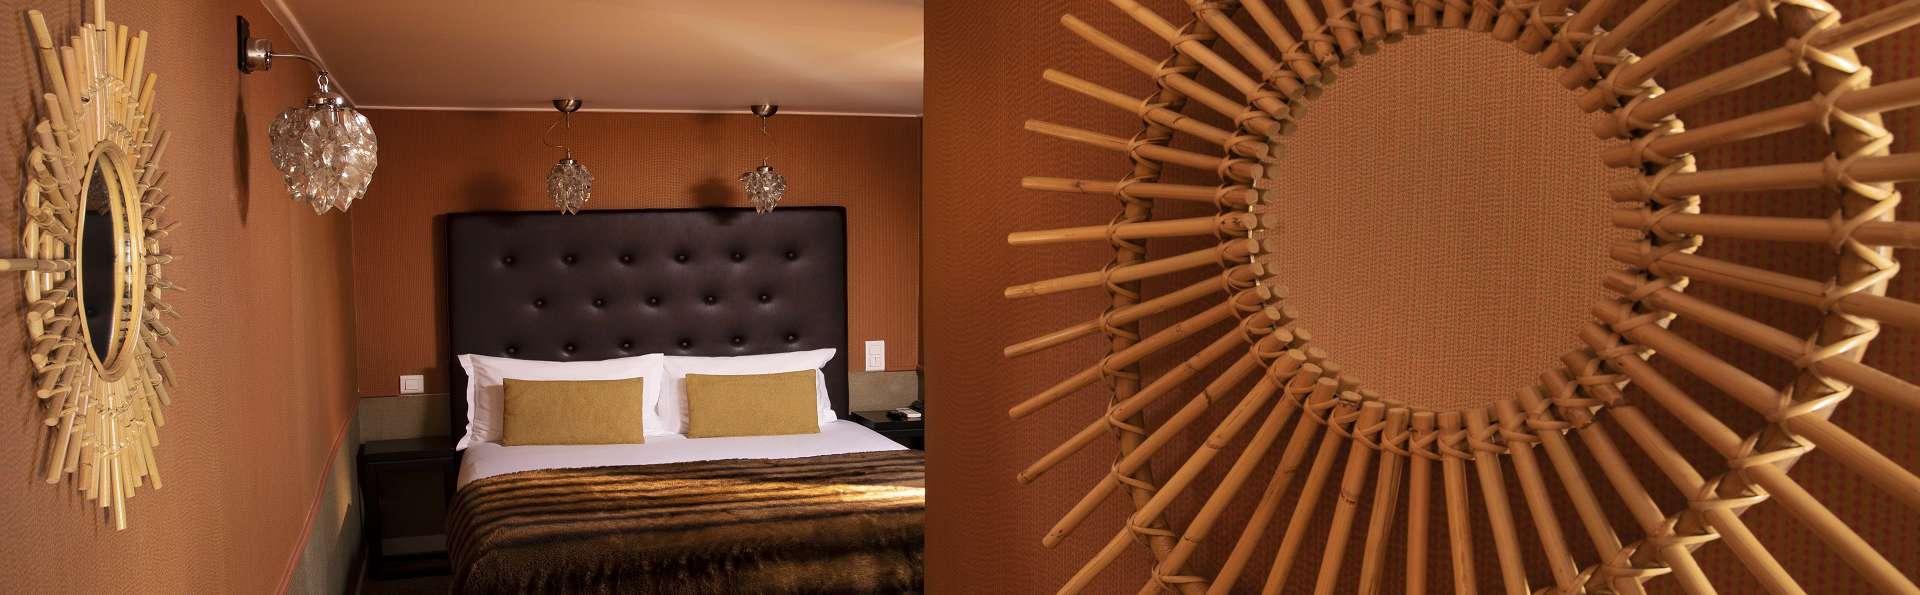 Hôtel Lodge du Centre - 48940941402_6327d10ca2_o.jpg